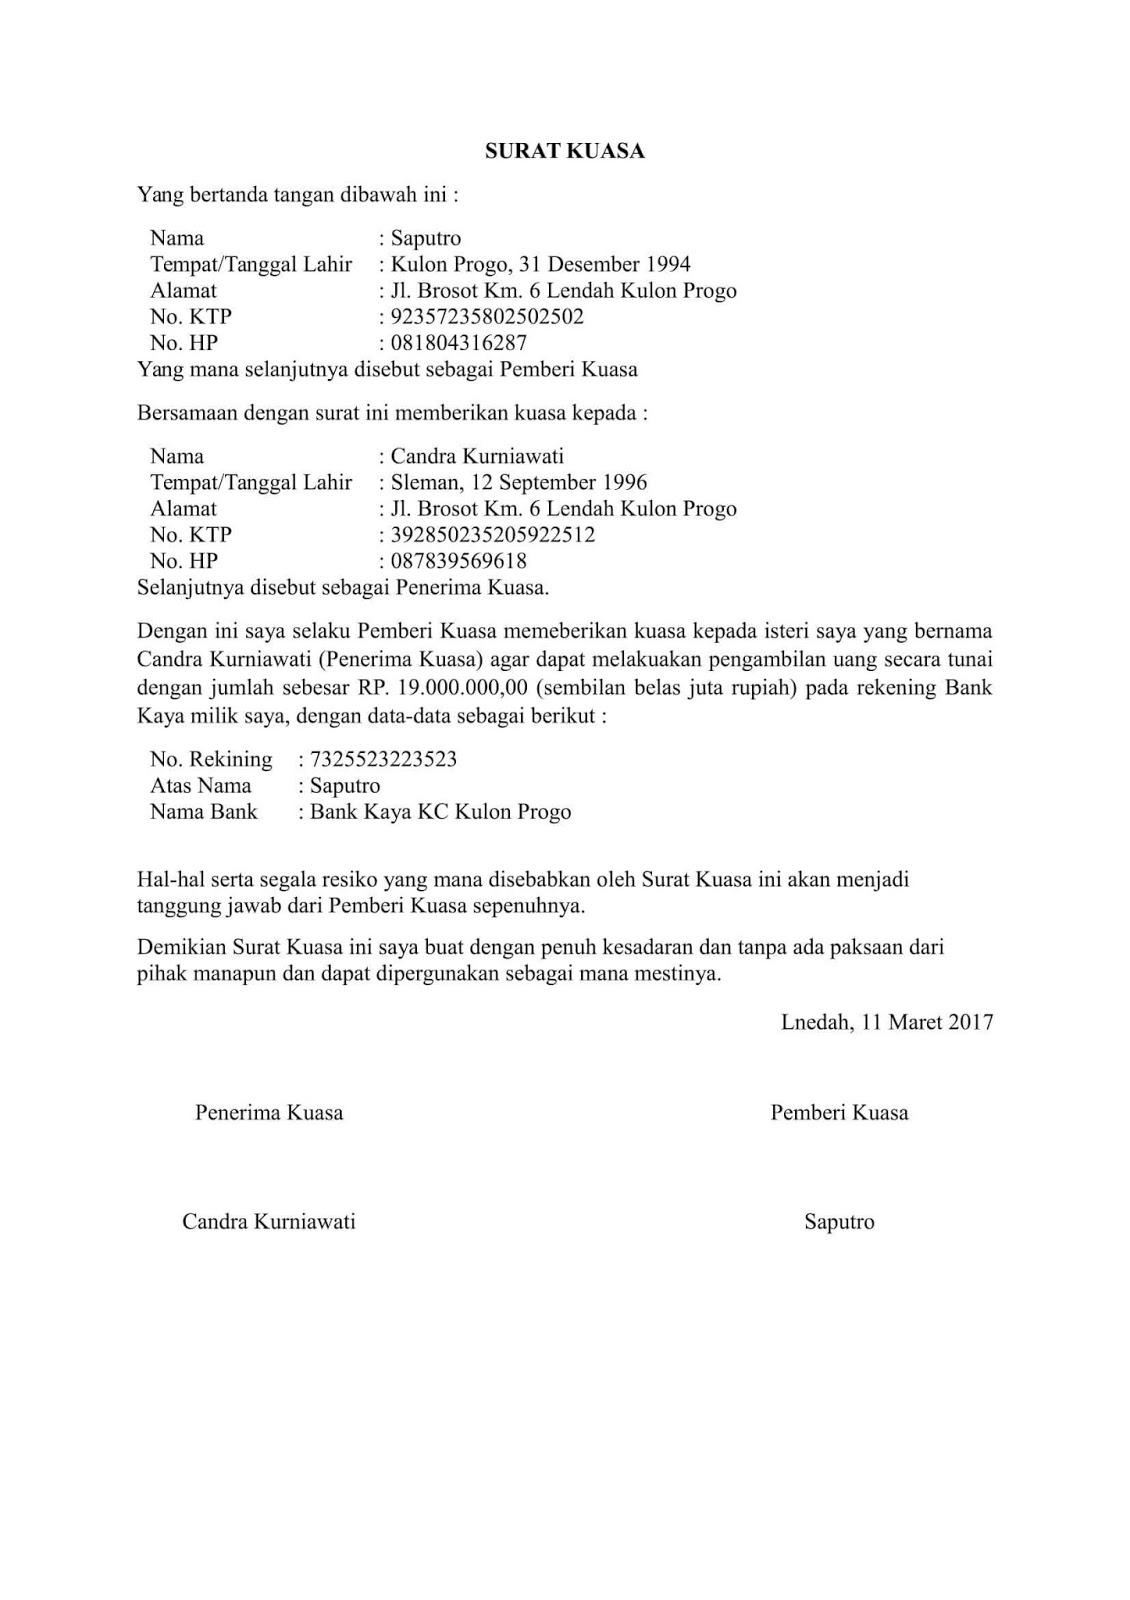 Contoh Surat Kuasa Balik Nama Indihome Contoh Surat Kuasa